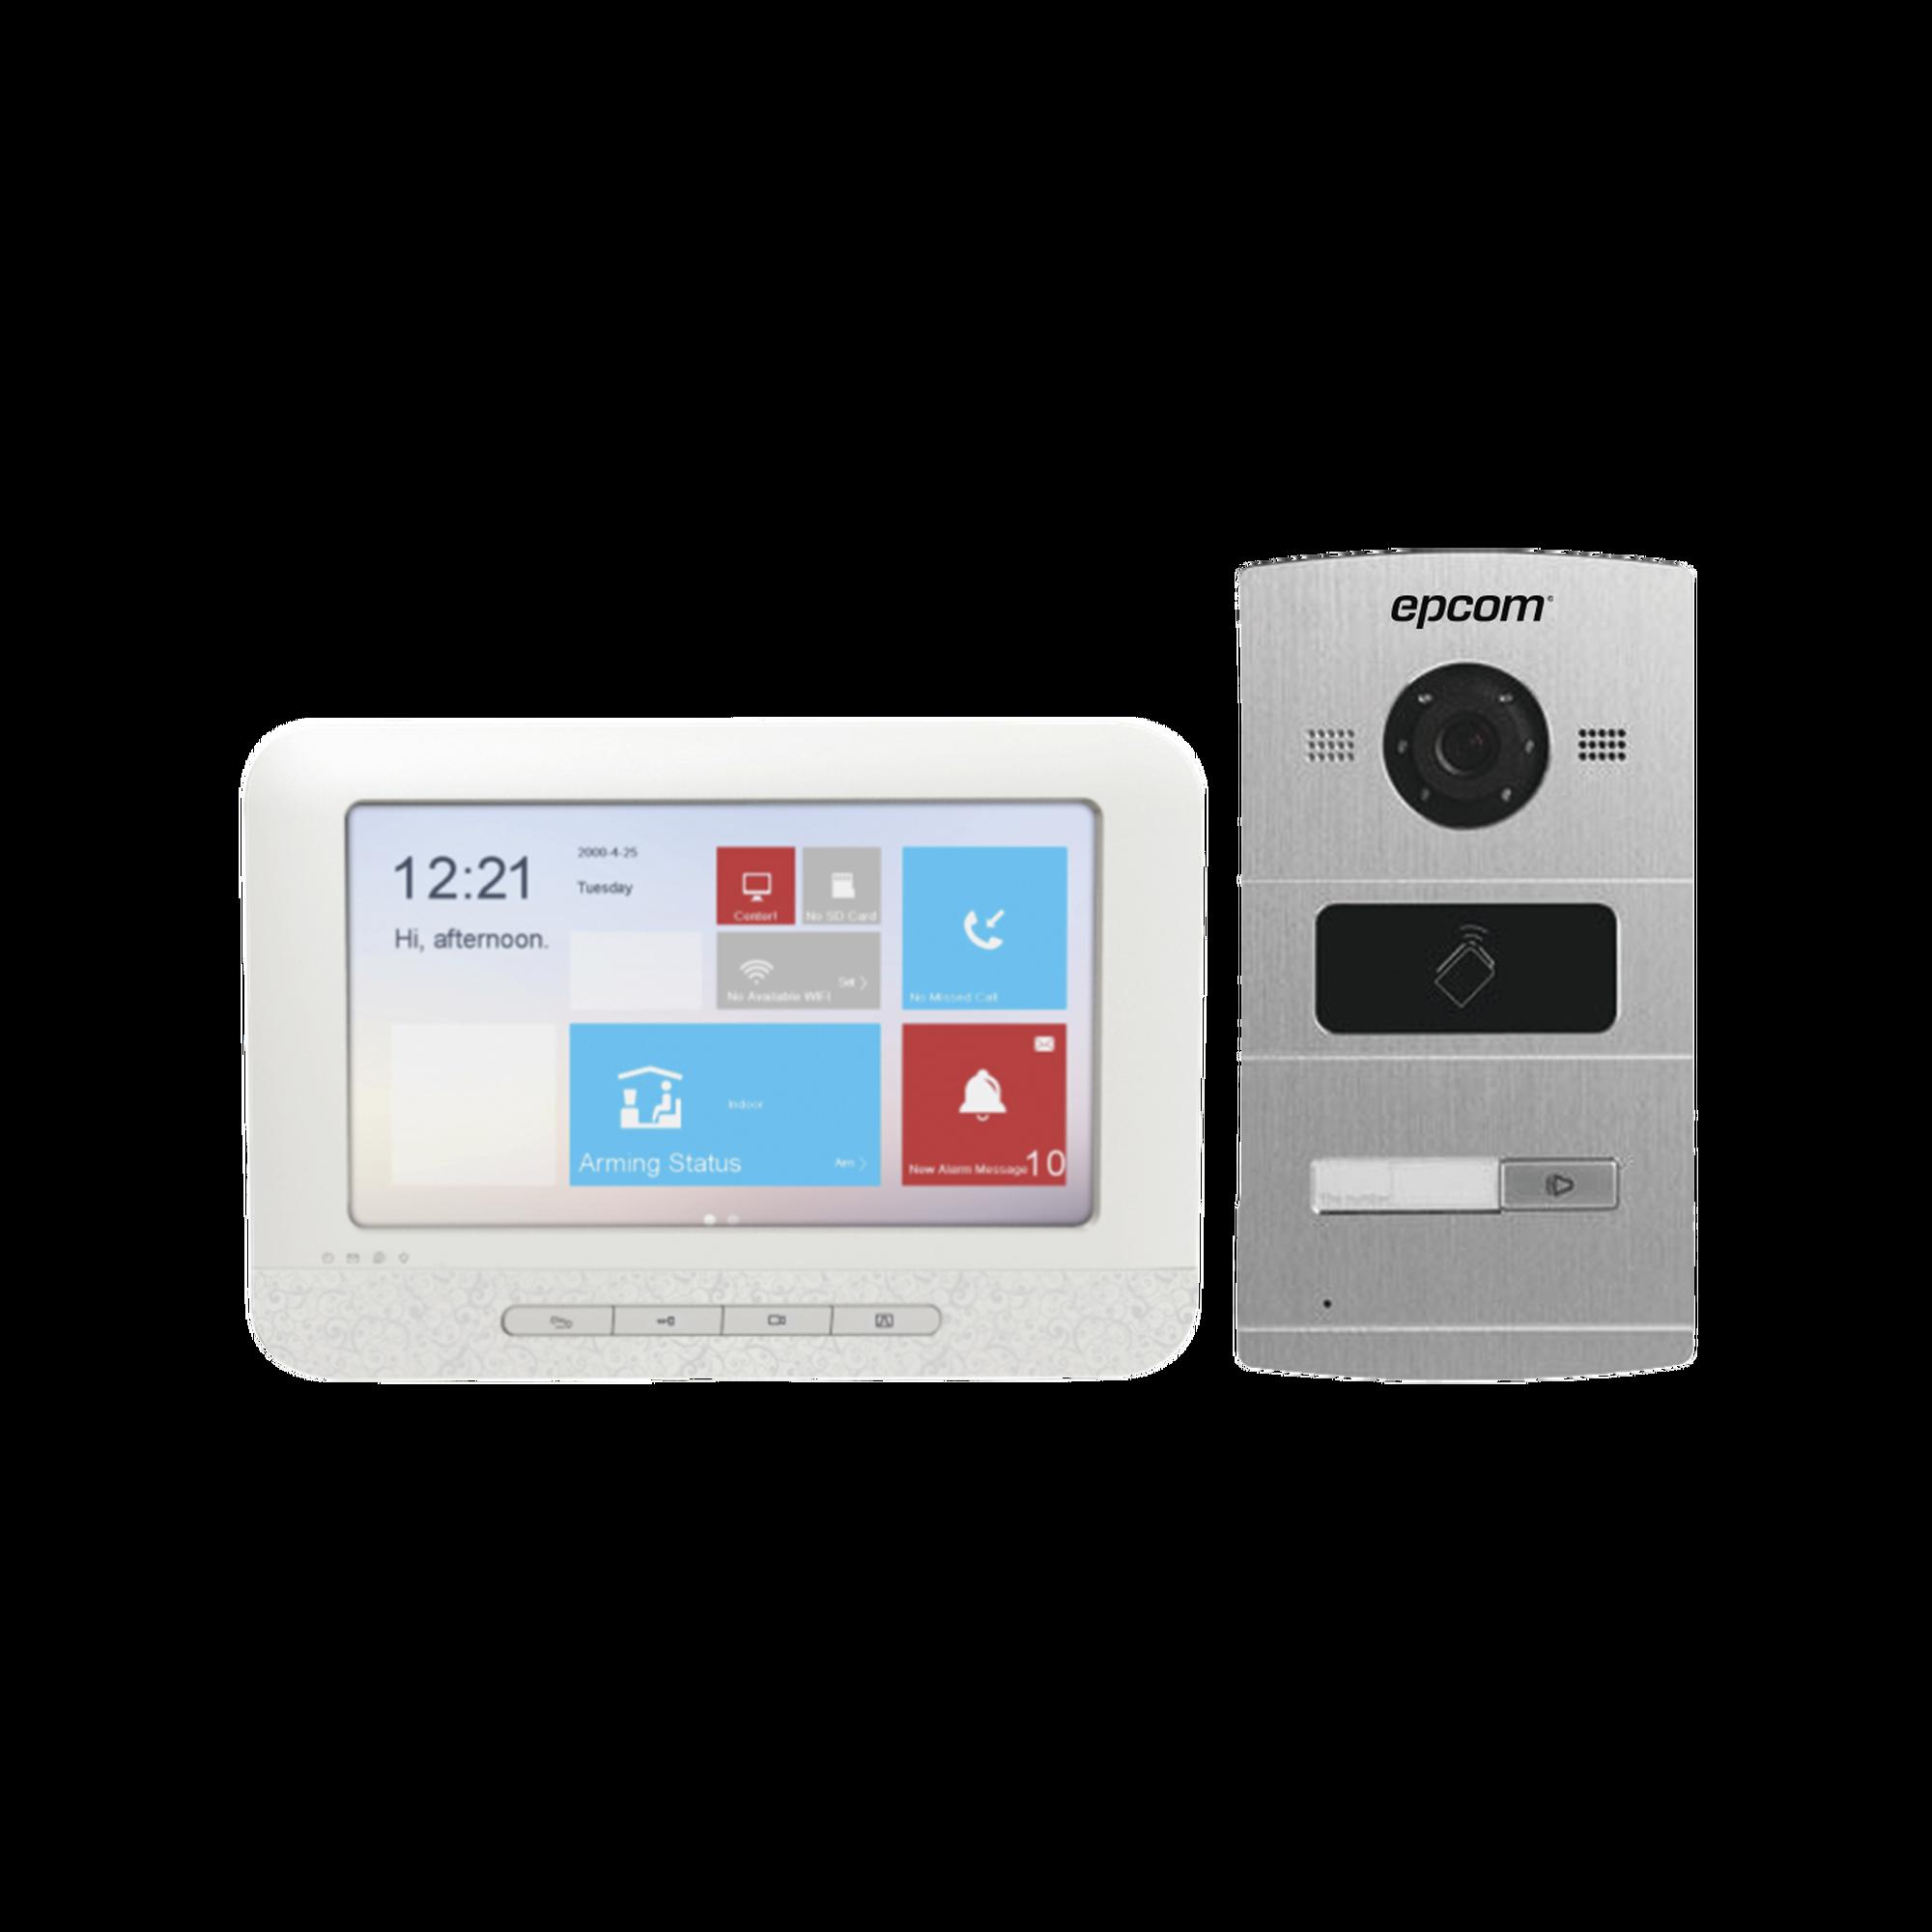 KIT Video Portero IP / pantalla Touch screen 7 / P2P / Apertura de puerta desde monitor y App.